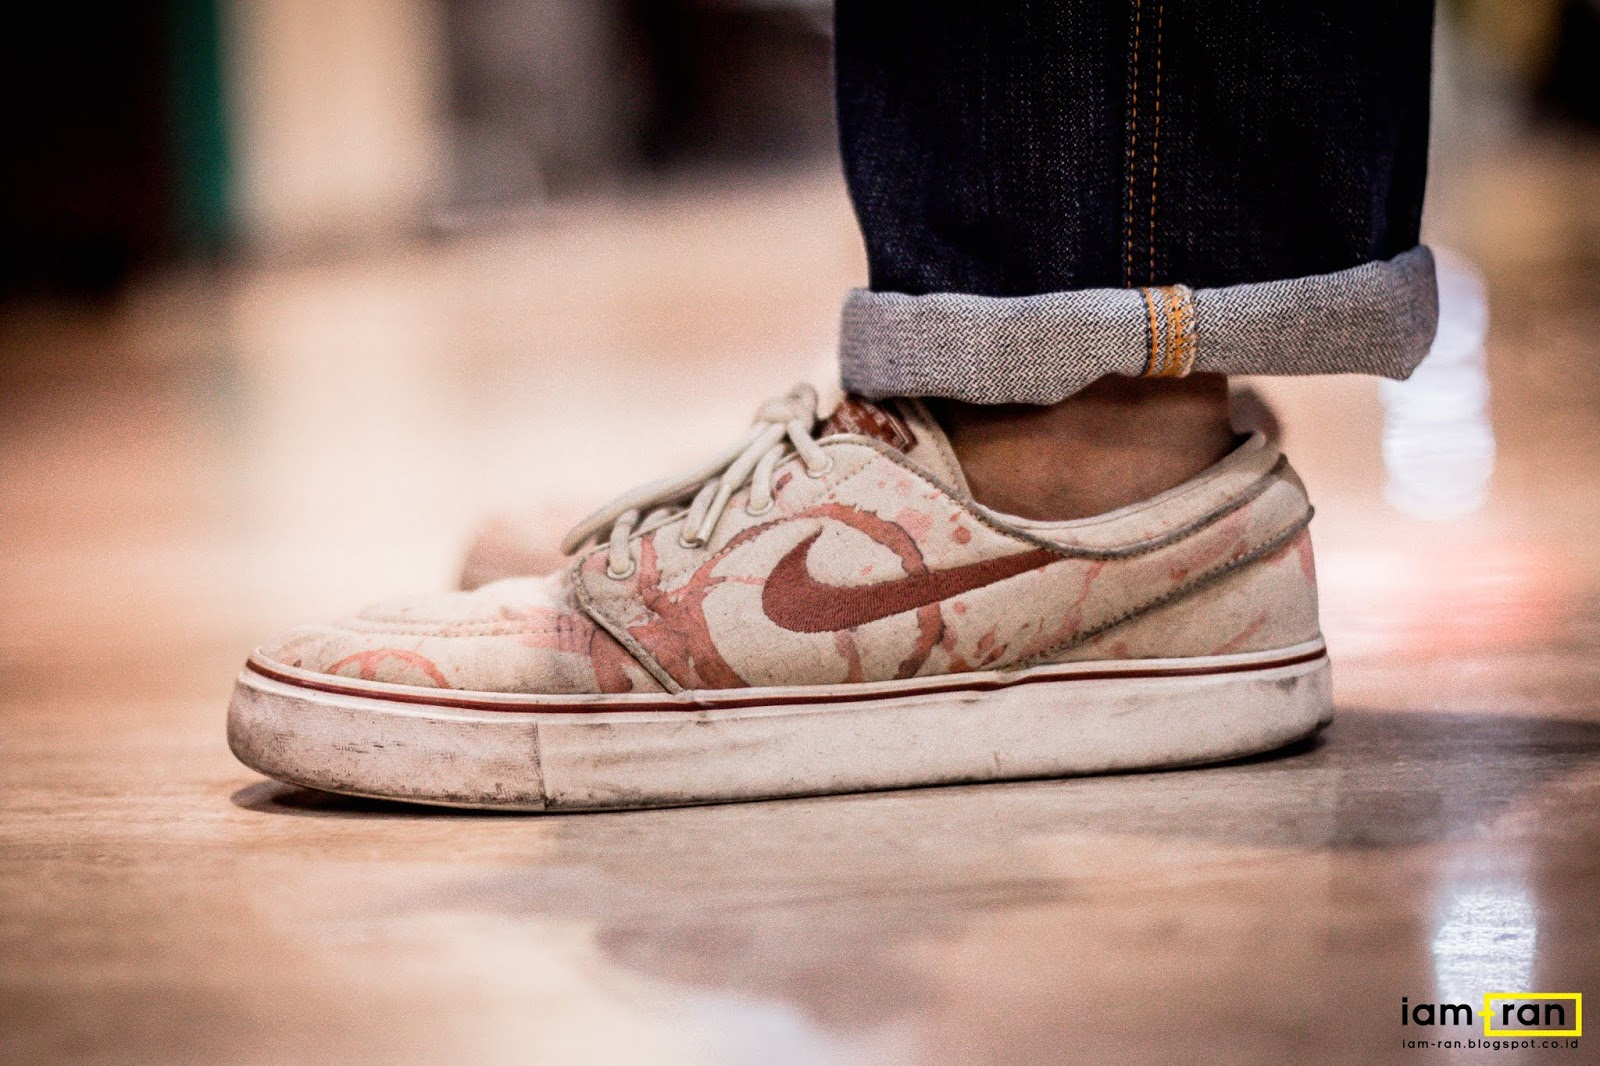 Mm paquete plato  IAM-RAN: ON FEET : Dimas - Nike SB Zoom Stefan Janoski